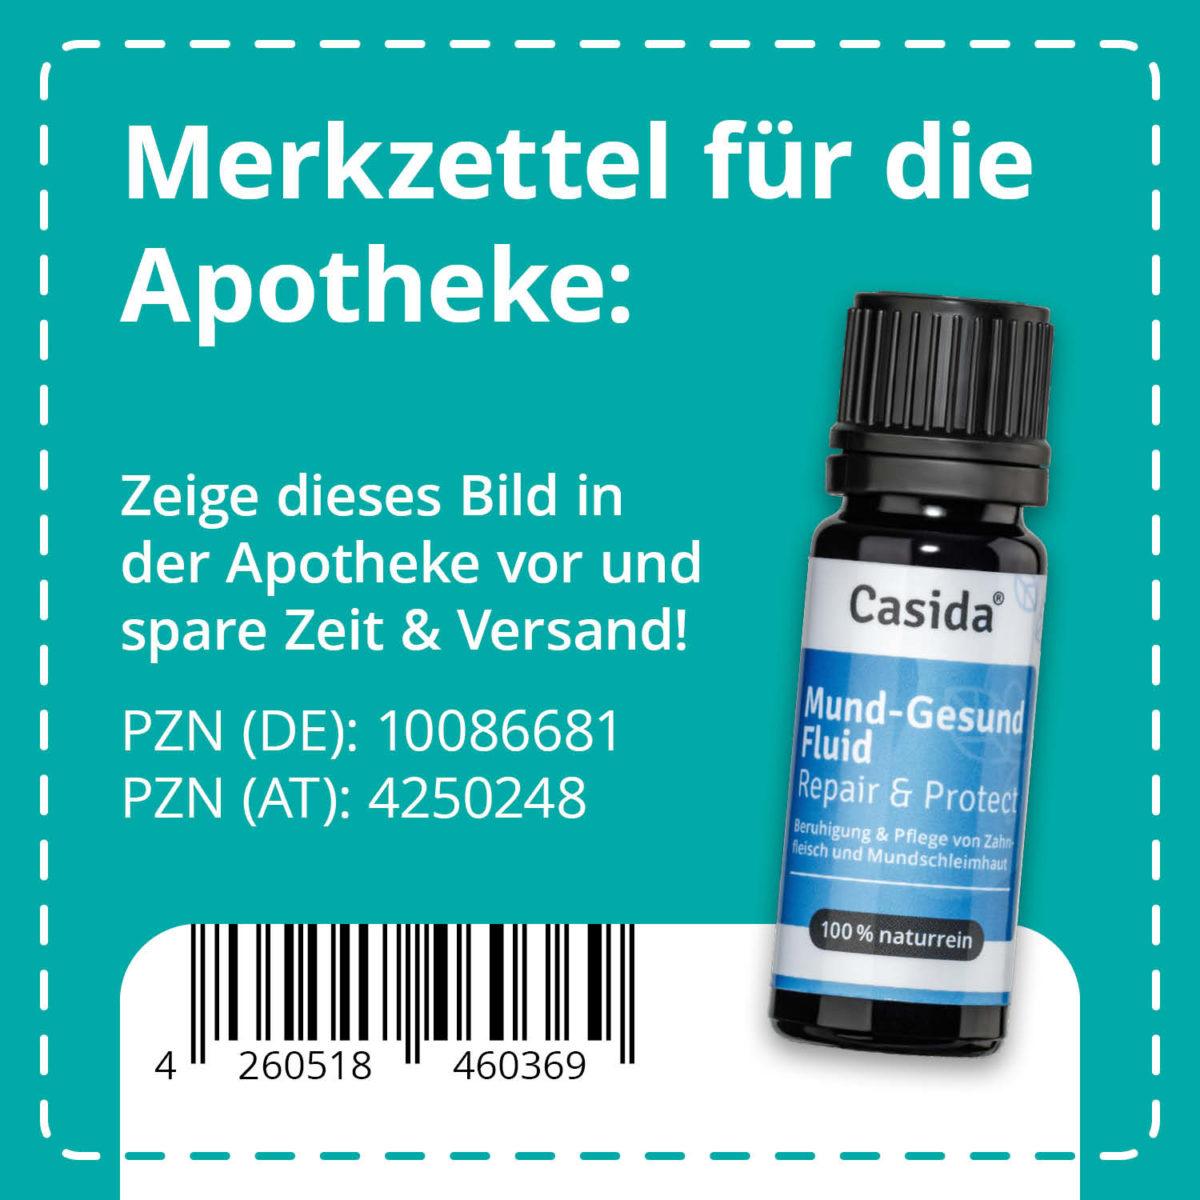 Casida Mouth and Gum Care Fluid Repair & Protect 10 ml PZN DE 10086681 PZN AT 4250248 UVP 13,95 € EAN 4260518460369